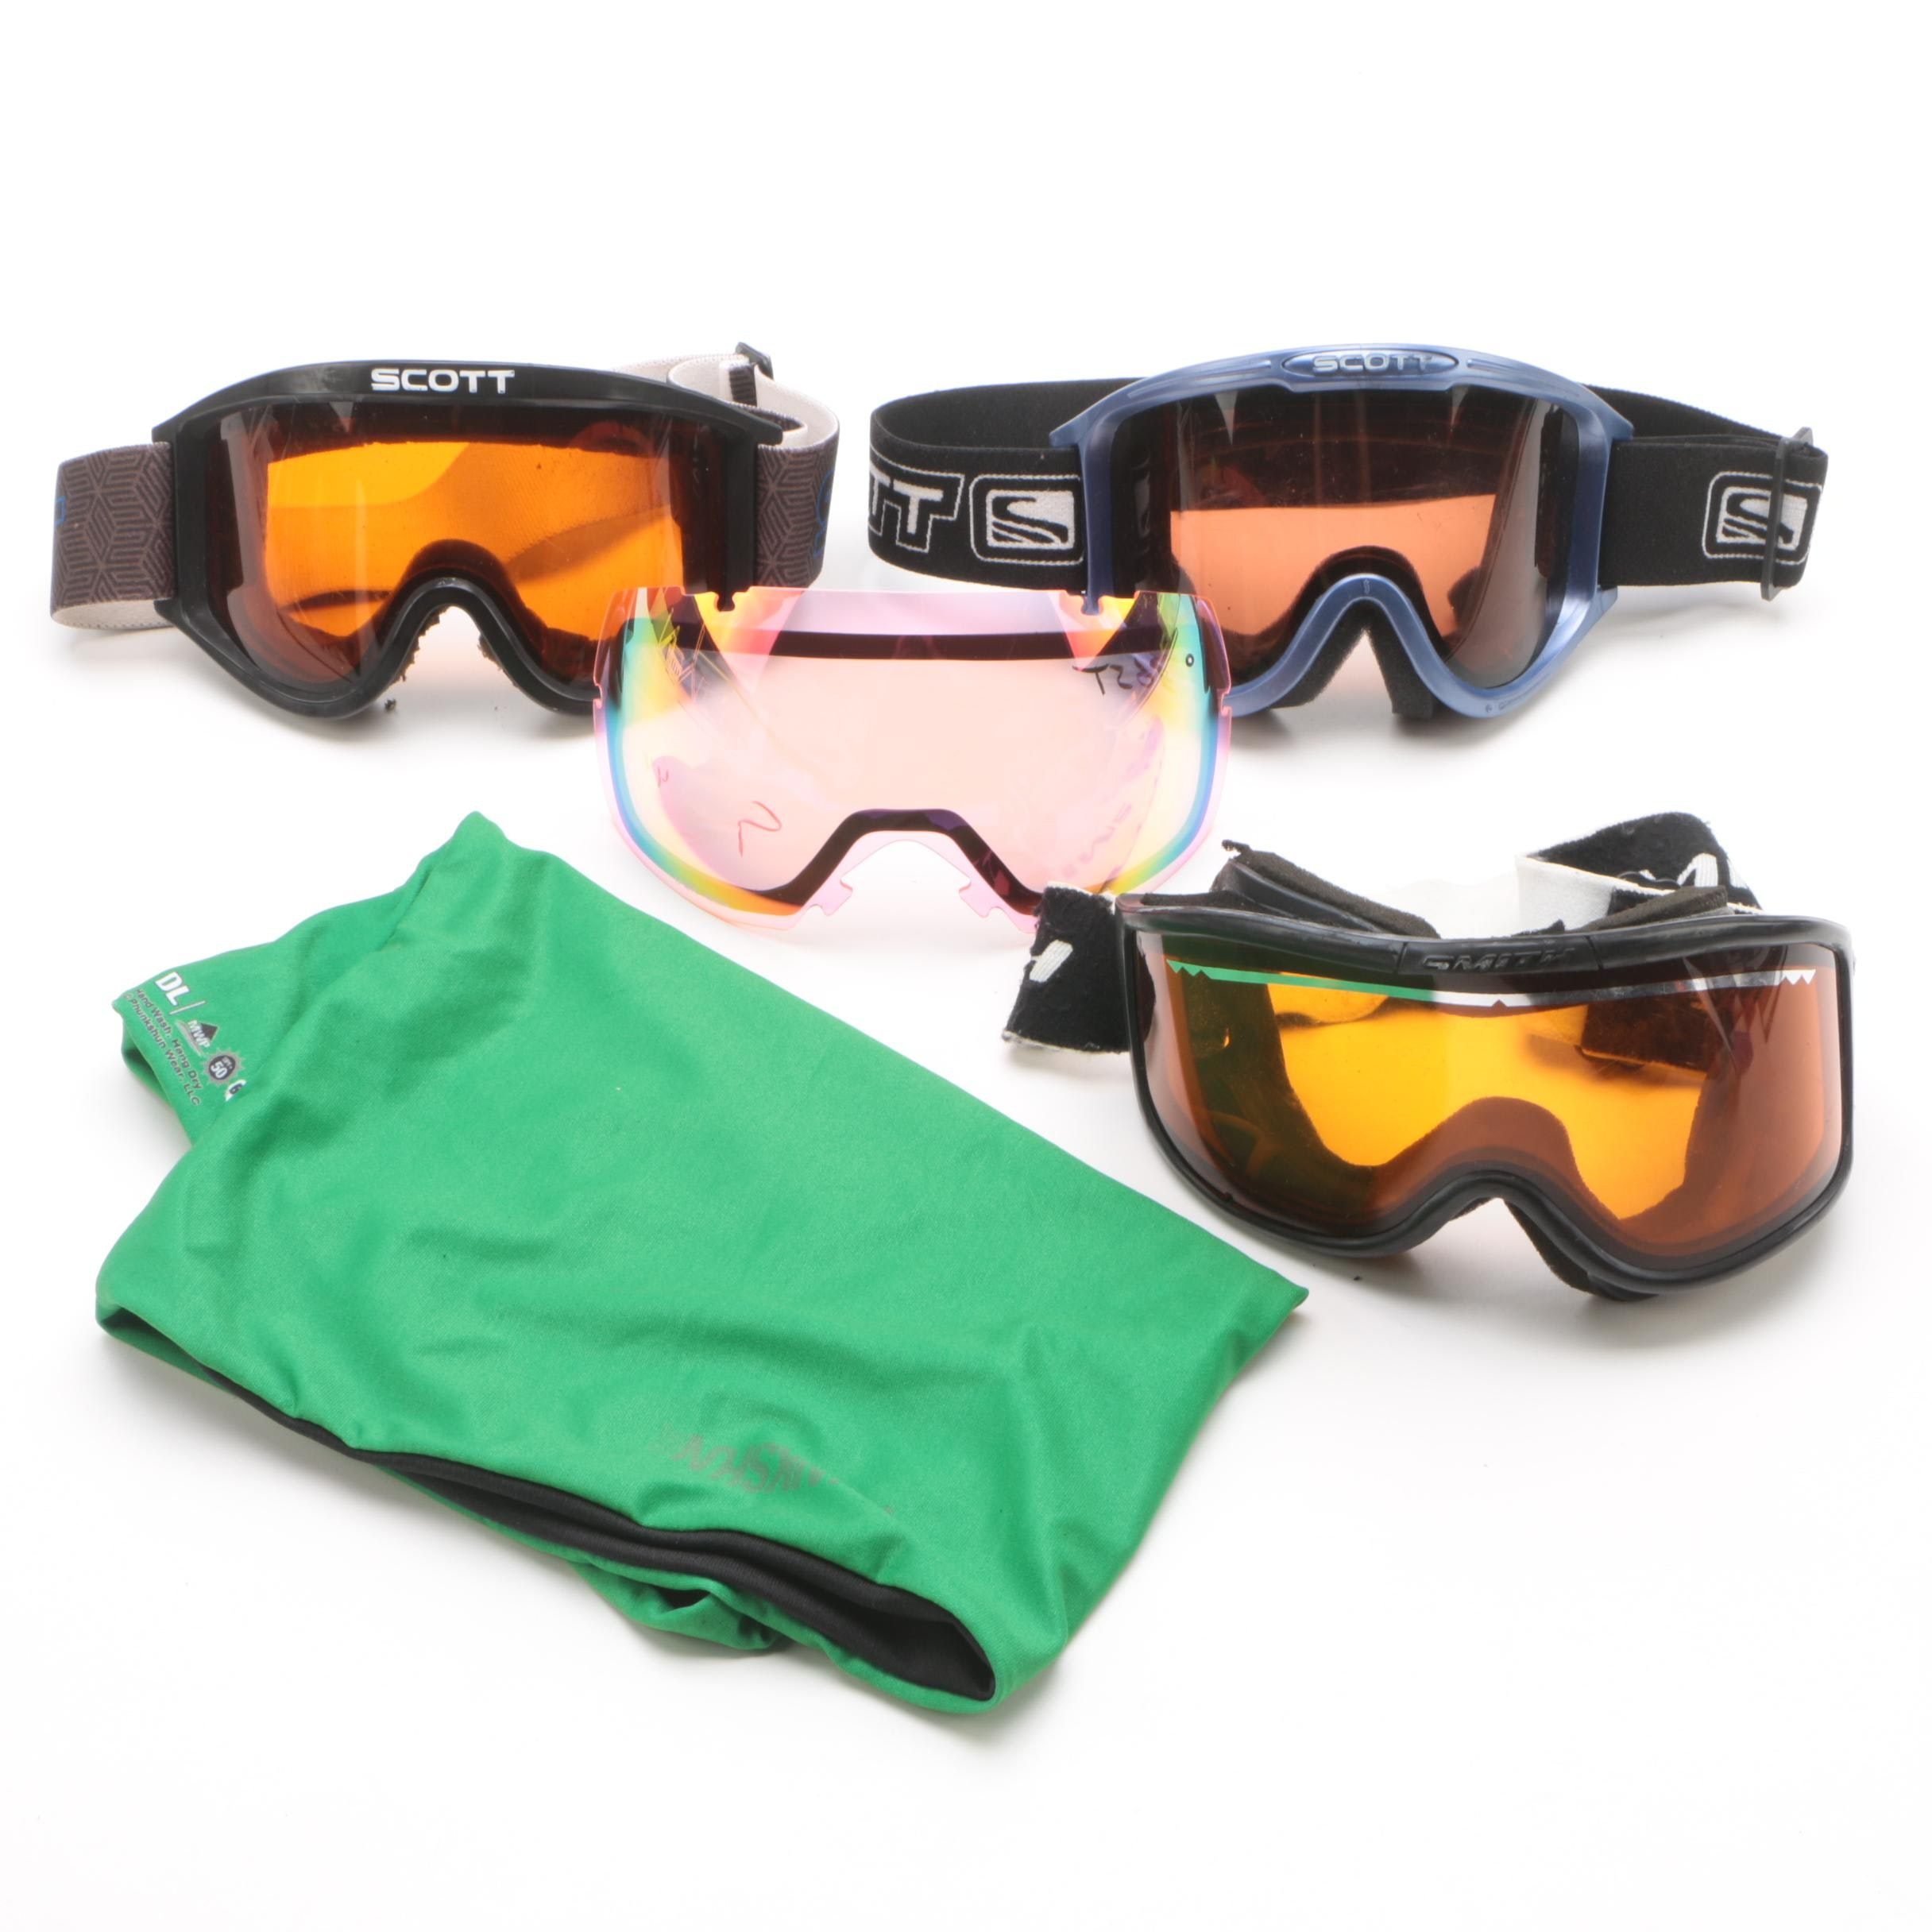 Scott and Smith Ski Goggles with Phunkshun Neck Tube